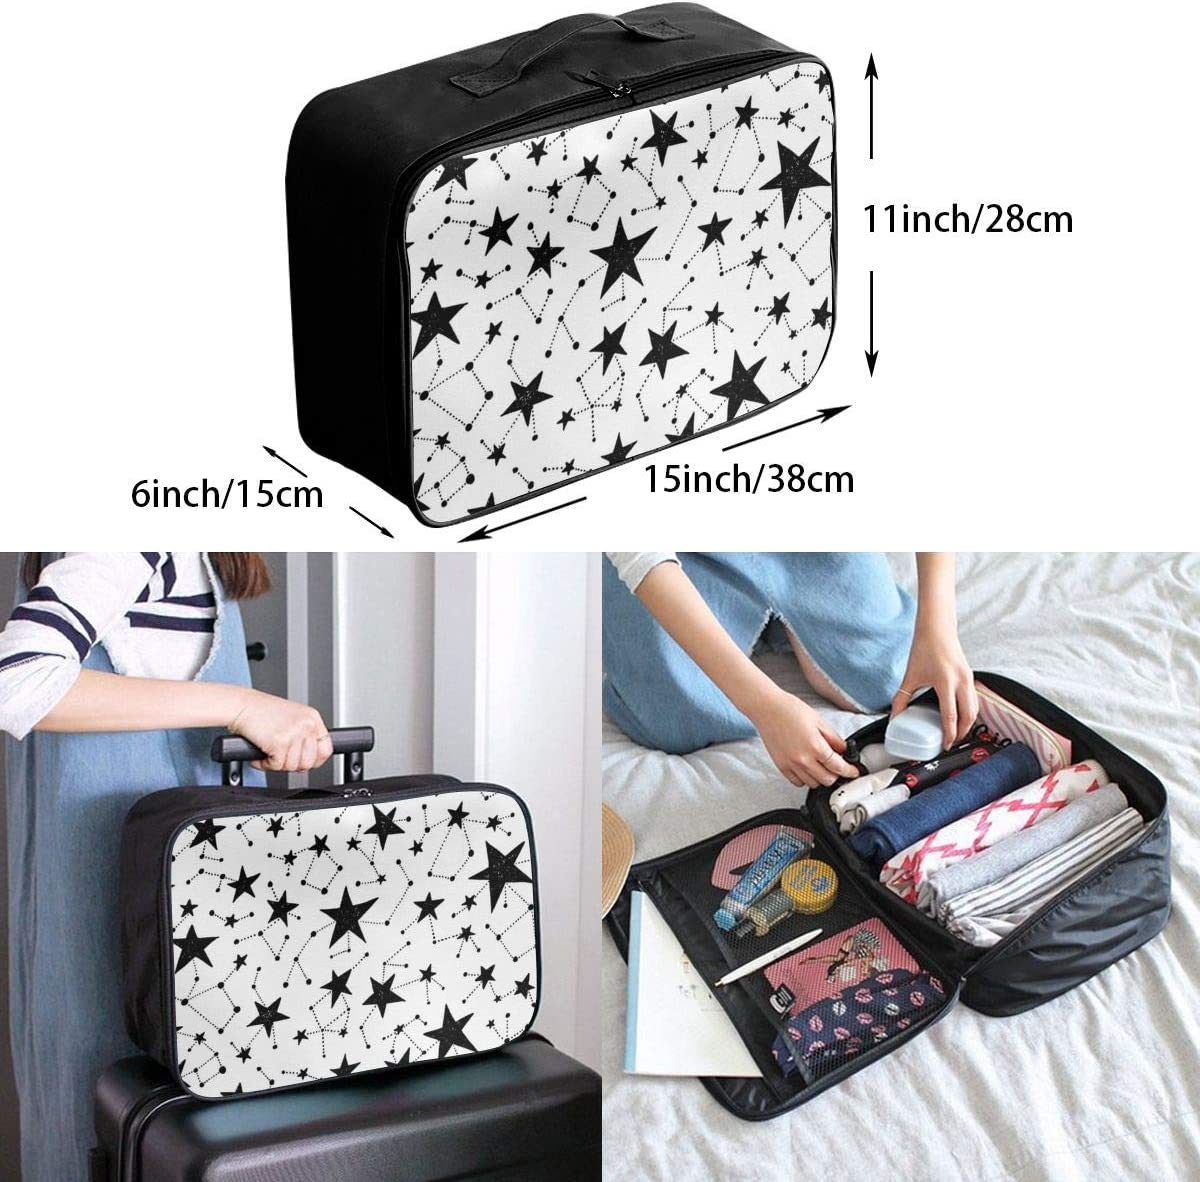 Yunshm Black And White Background Stars Customized Trolley Handbag Waterproof Unisex Large Capacity For Business Travel Storage